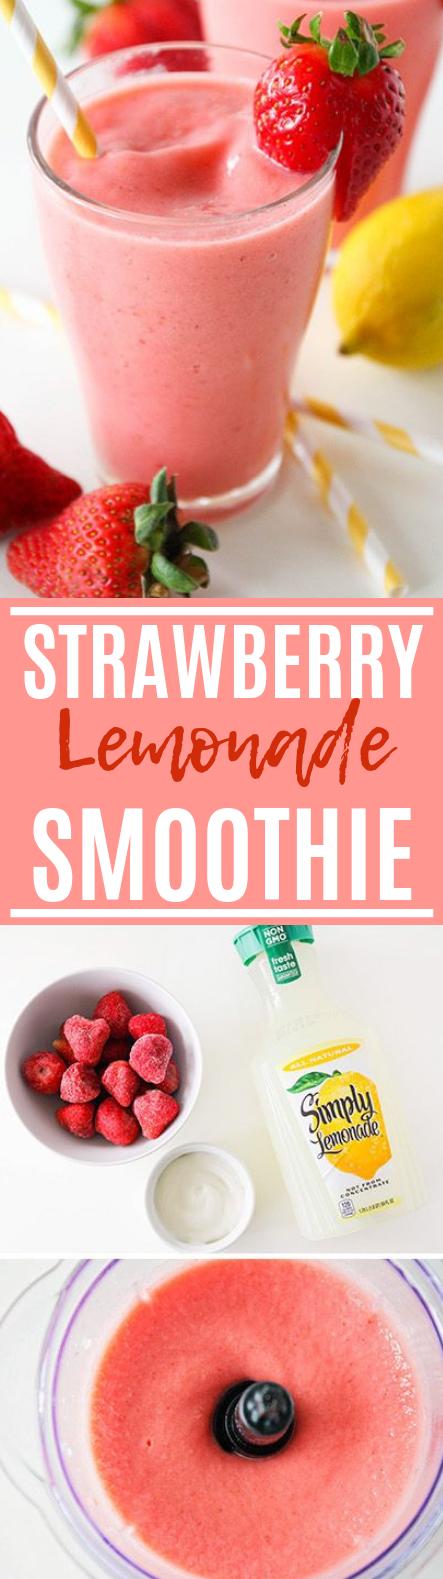 Strawberry Lemonade Smoothie #healthy #drinksrecipe